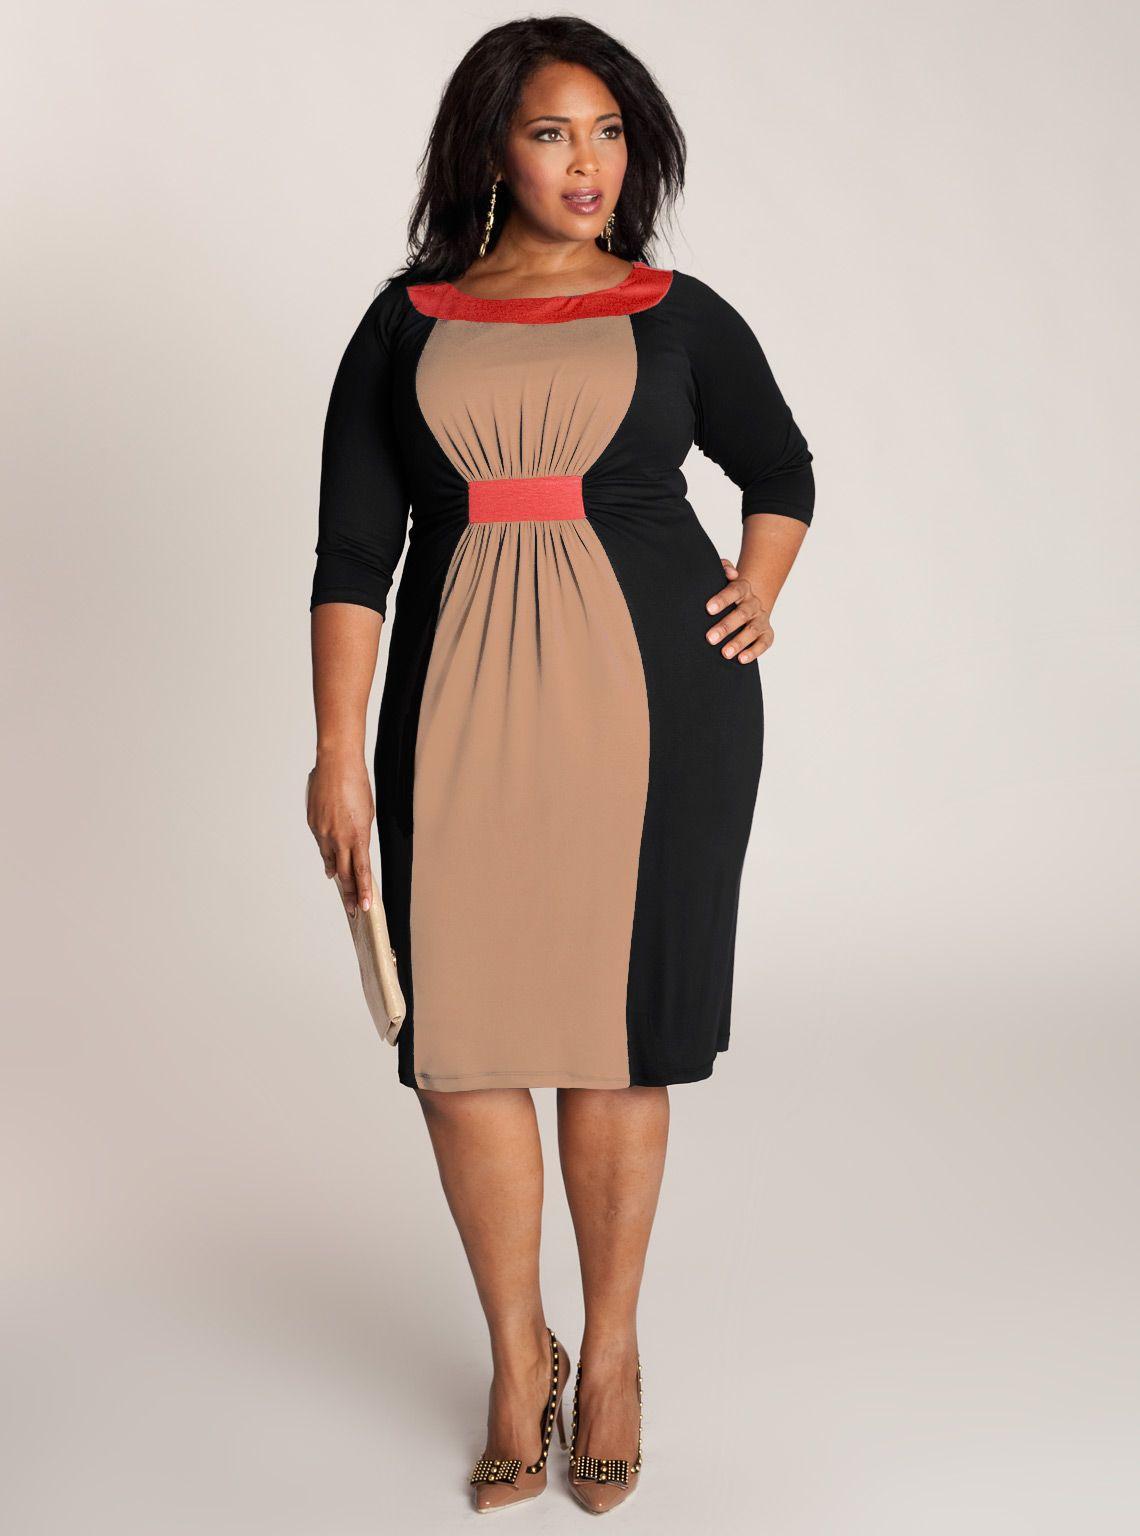 Sophie Plus Size Colorblock Dress In Black Stylesetgo